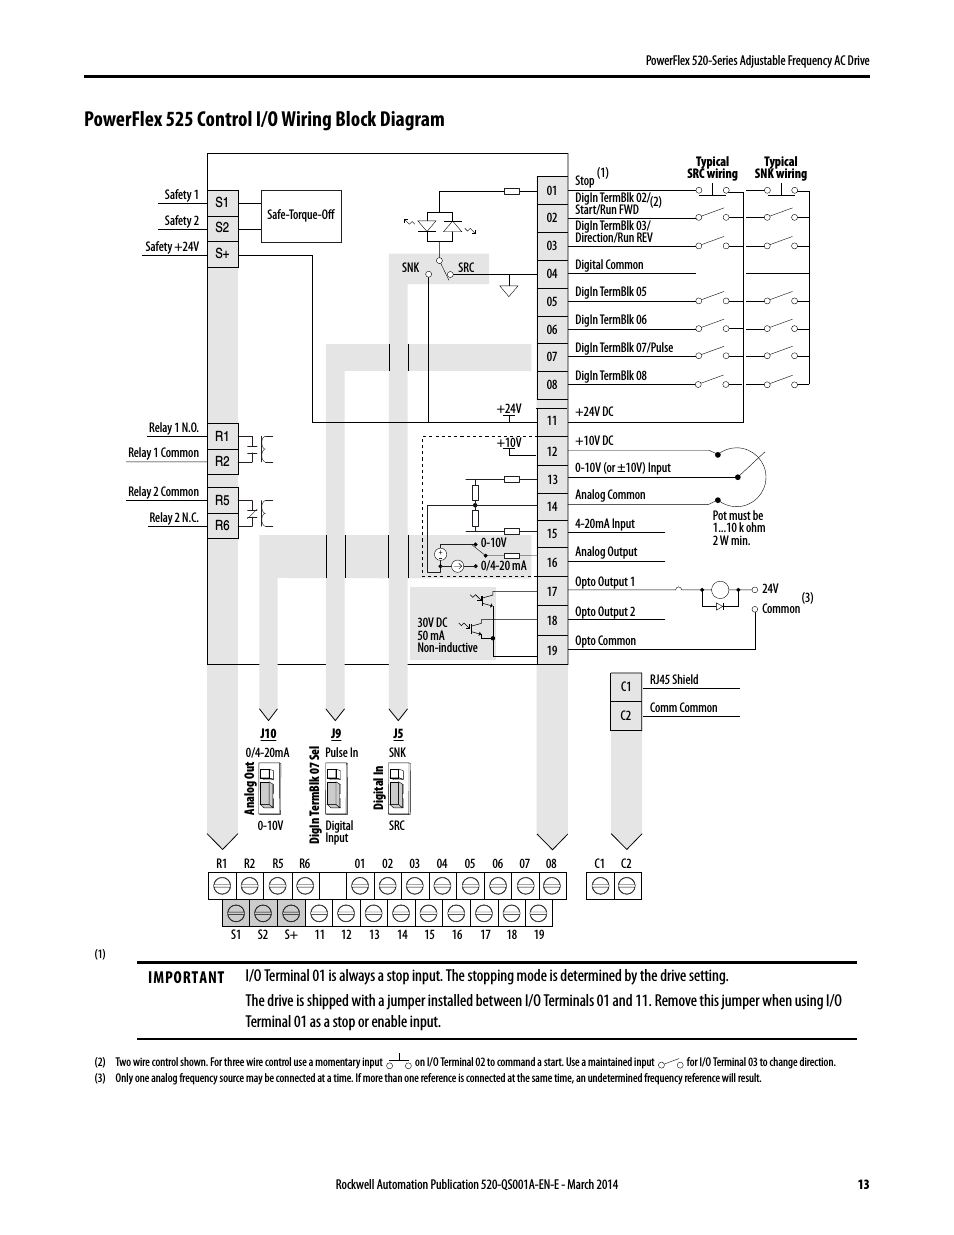 rockwell powerflex 700 wiring diagram 2008 f150 wire diagram -  musa.drwing-36.turismoderuta.it  free download wiring diagram and schematics